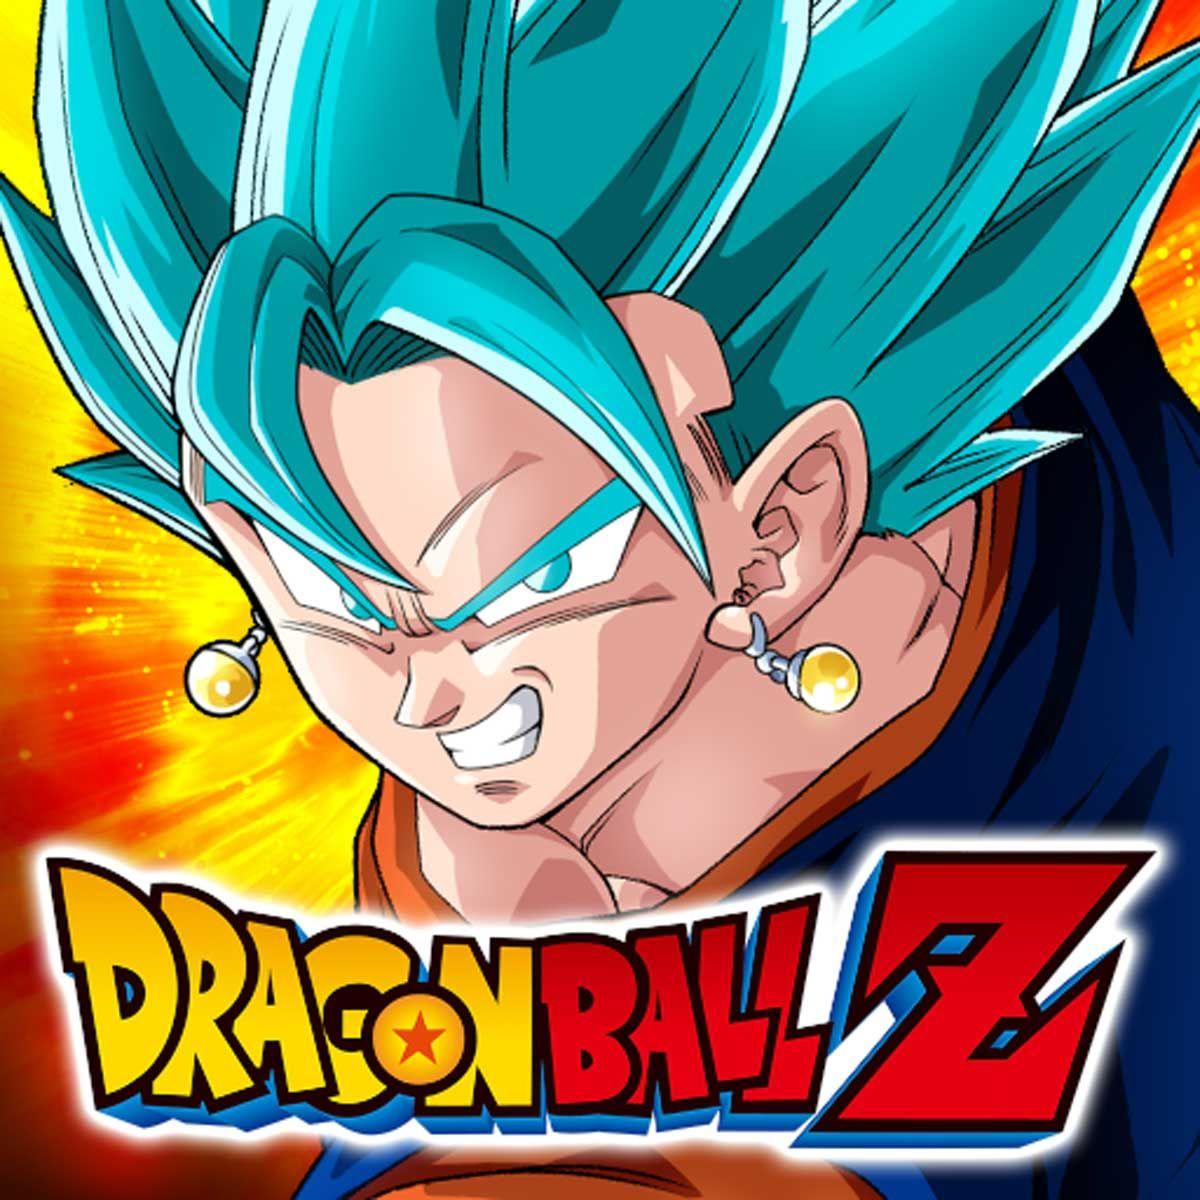 Dragon Ball Z Dokkan Battle Mod 4.8.4 Apk (Global) Mode